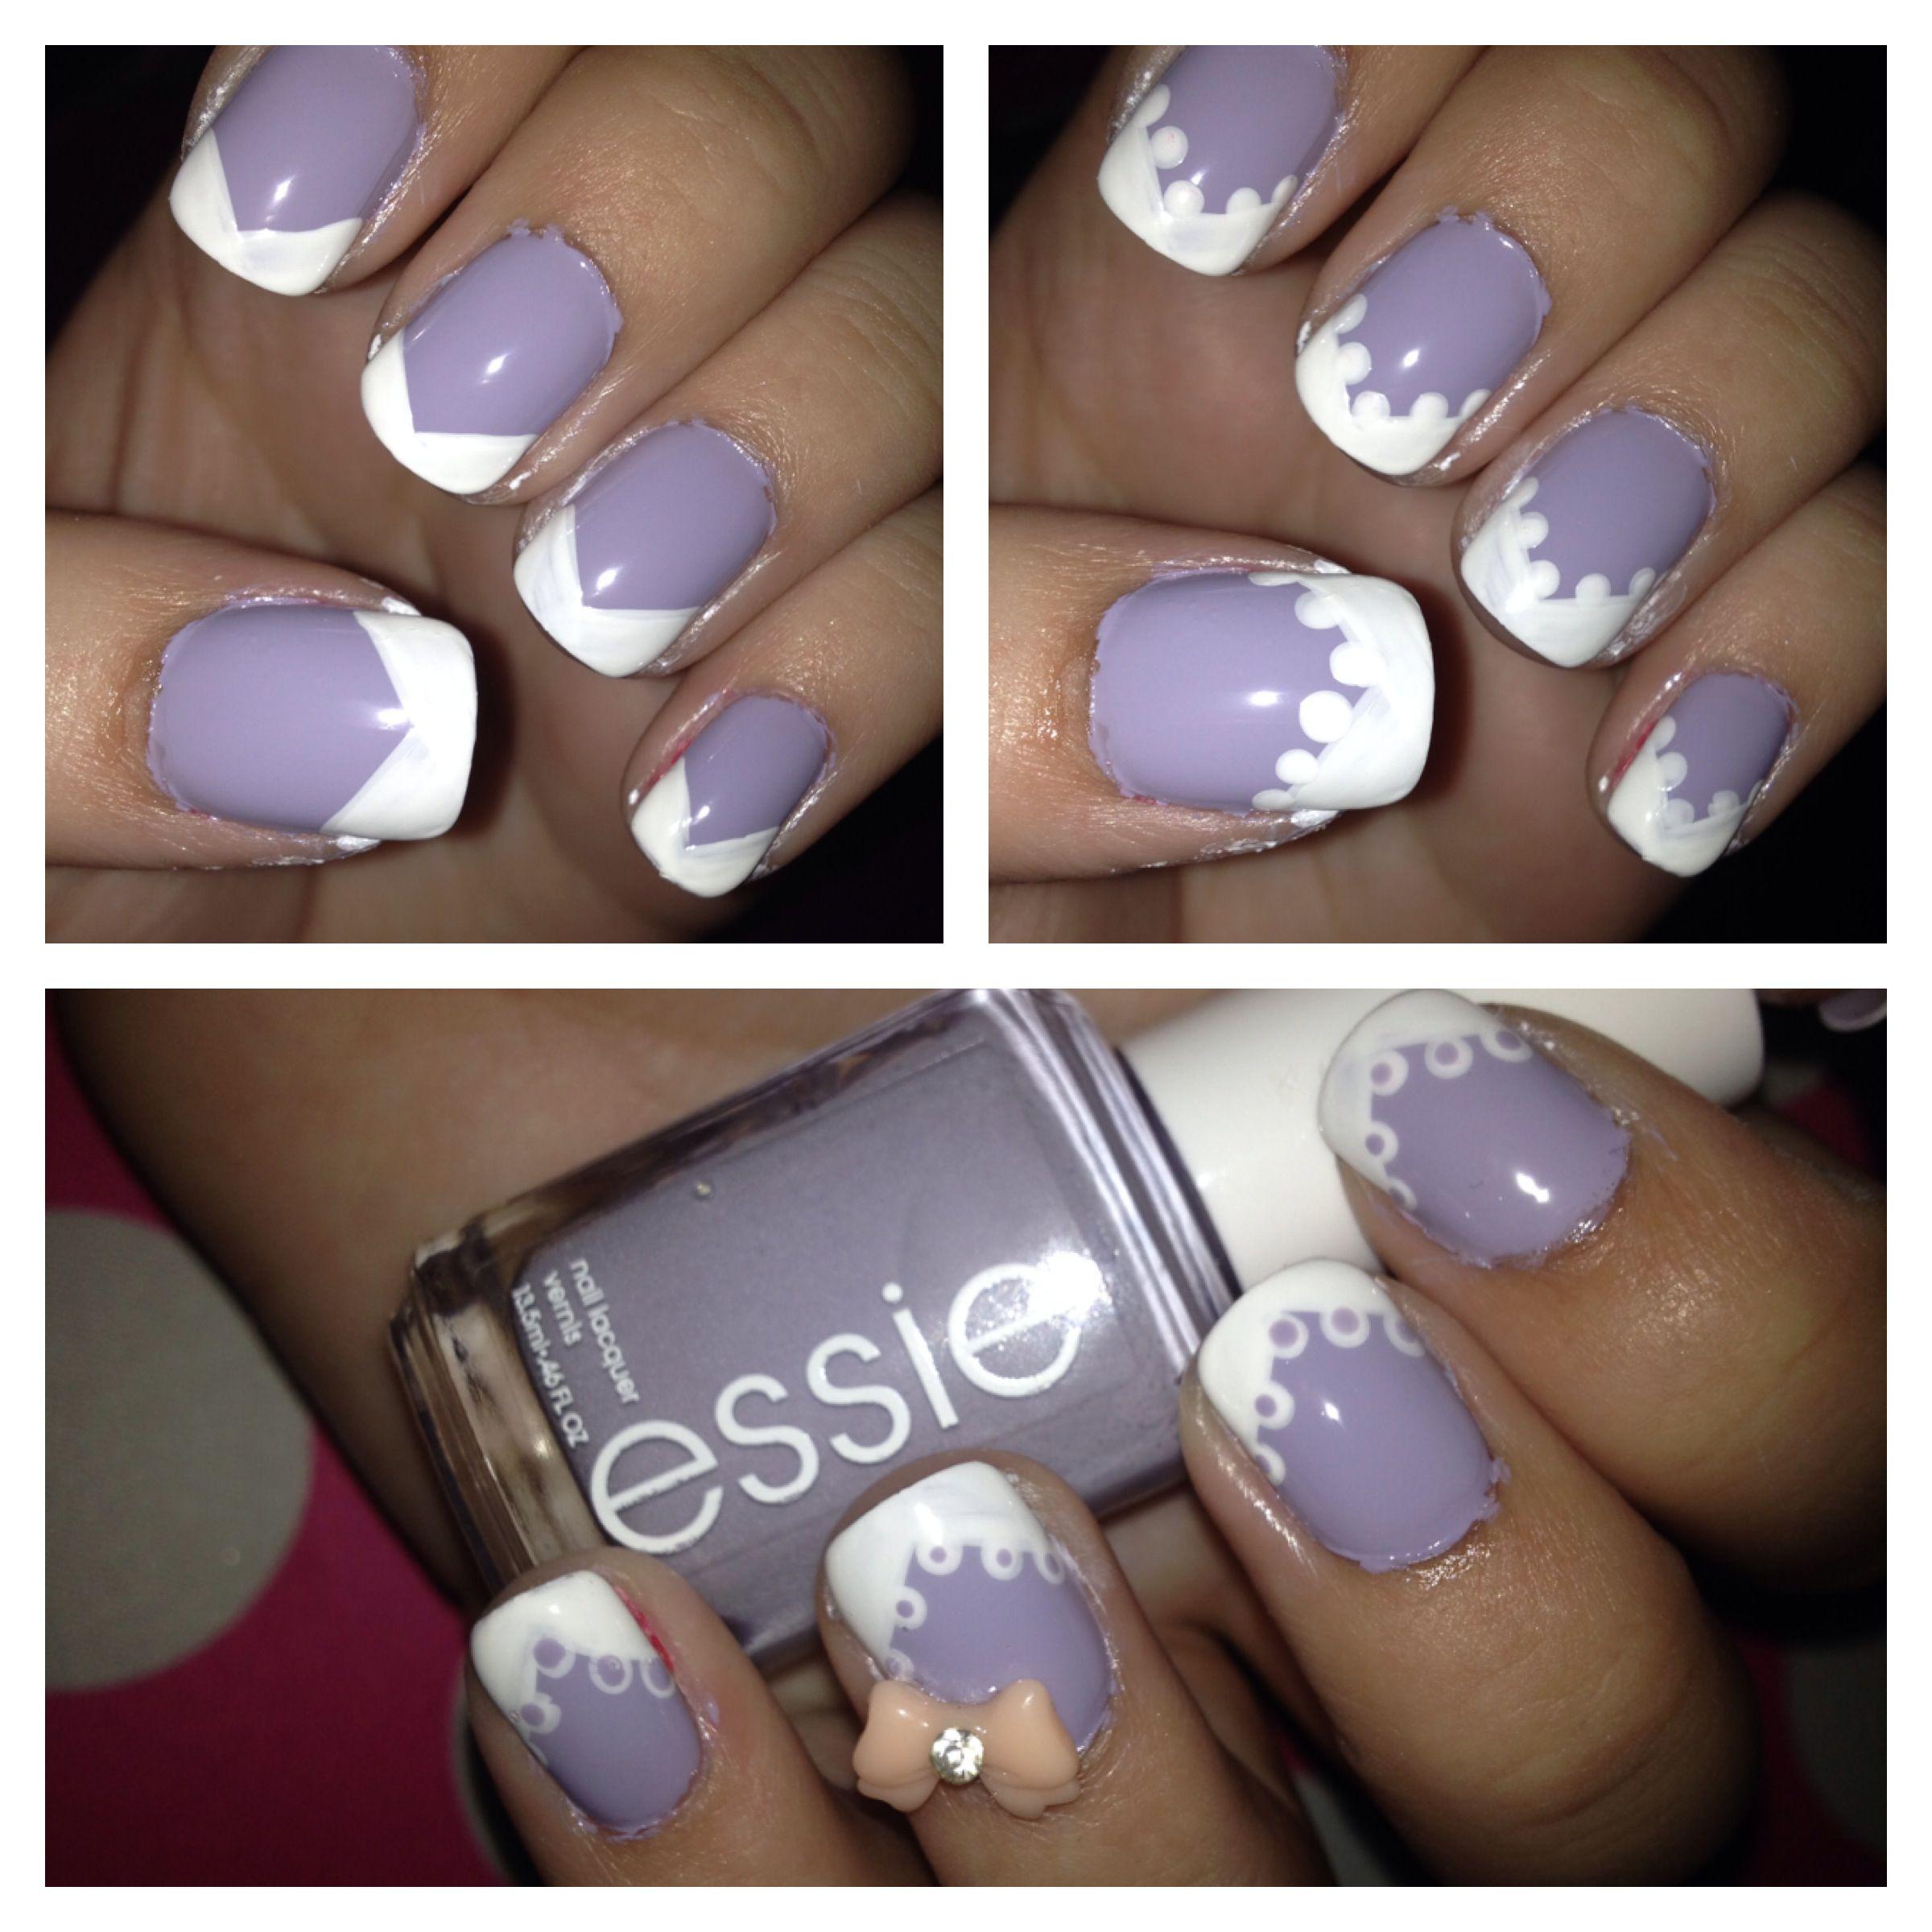 Lace Nail Art Tutorial! 1. Paint nails purple 2. Create a v-shaped ...